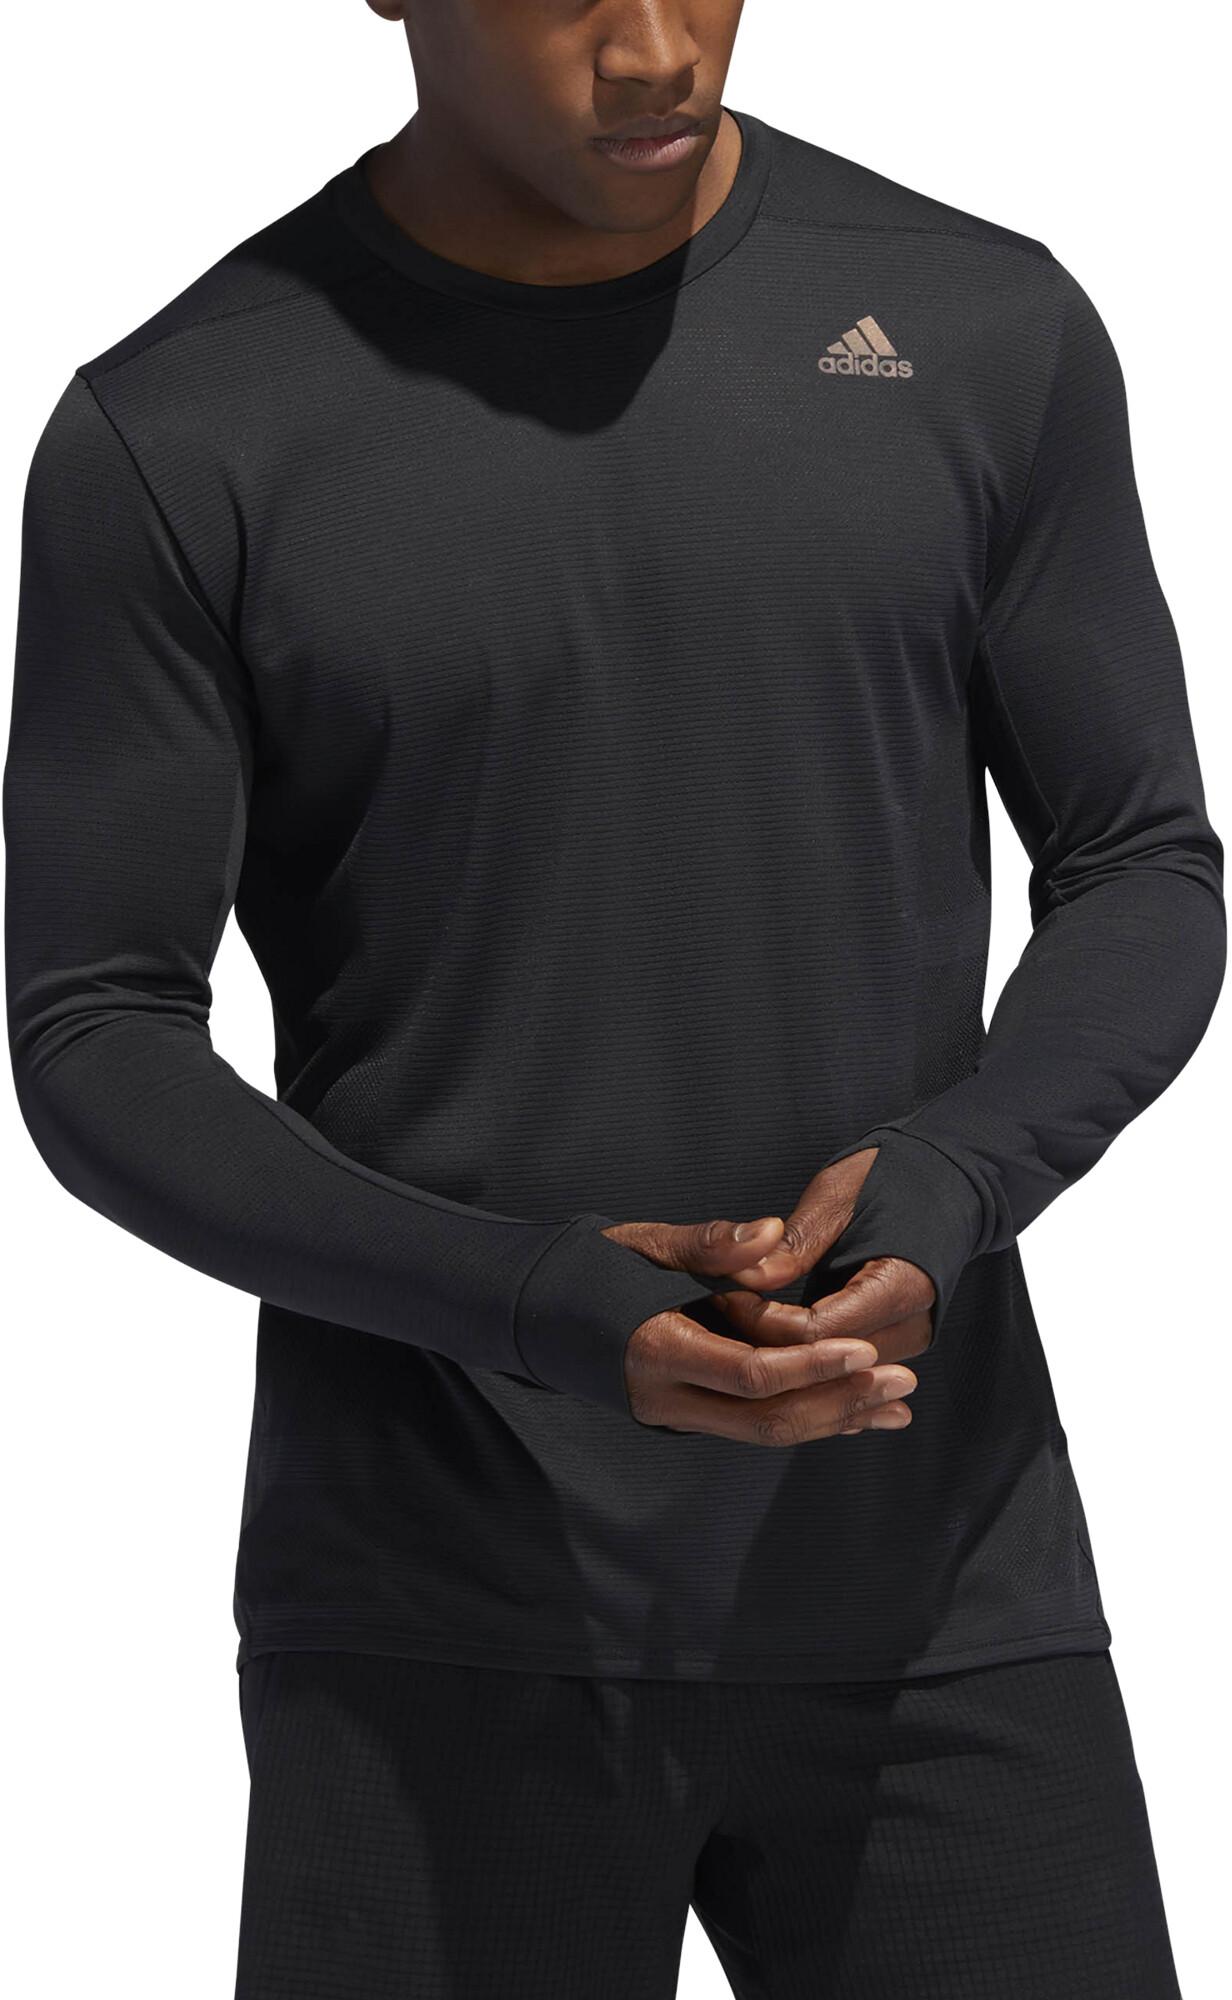 4436cbbae7d5b adidas Supernova - Camiseta manga larga running Hombre - negro ...